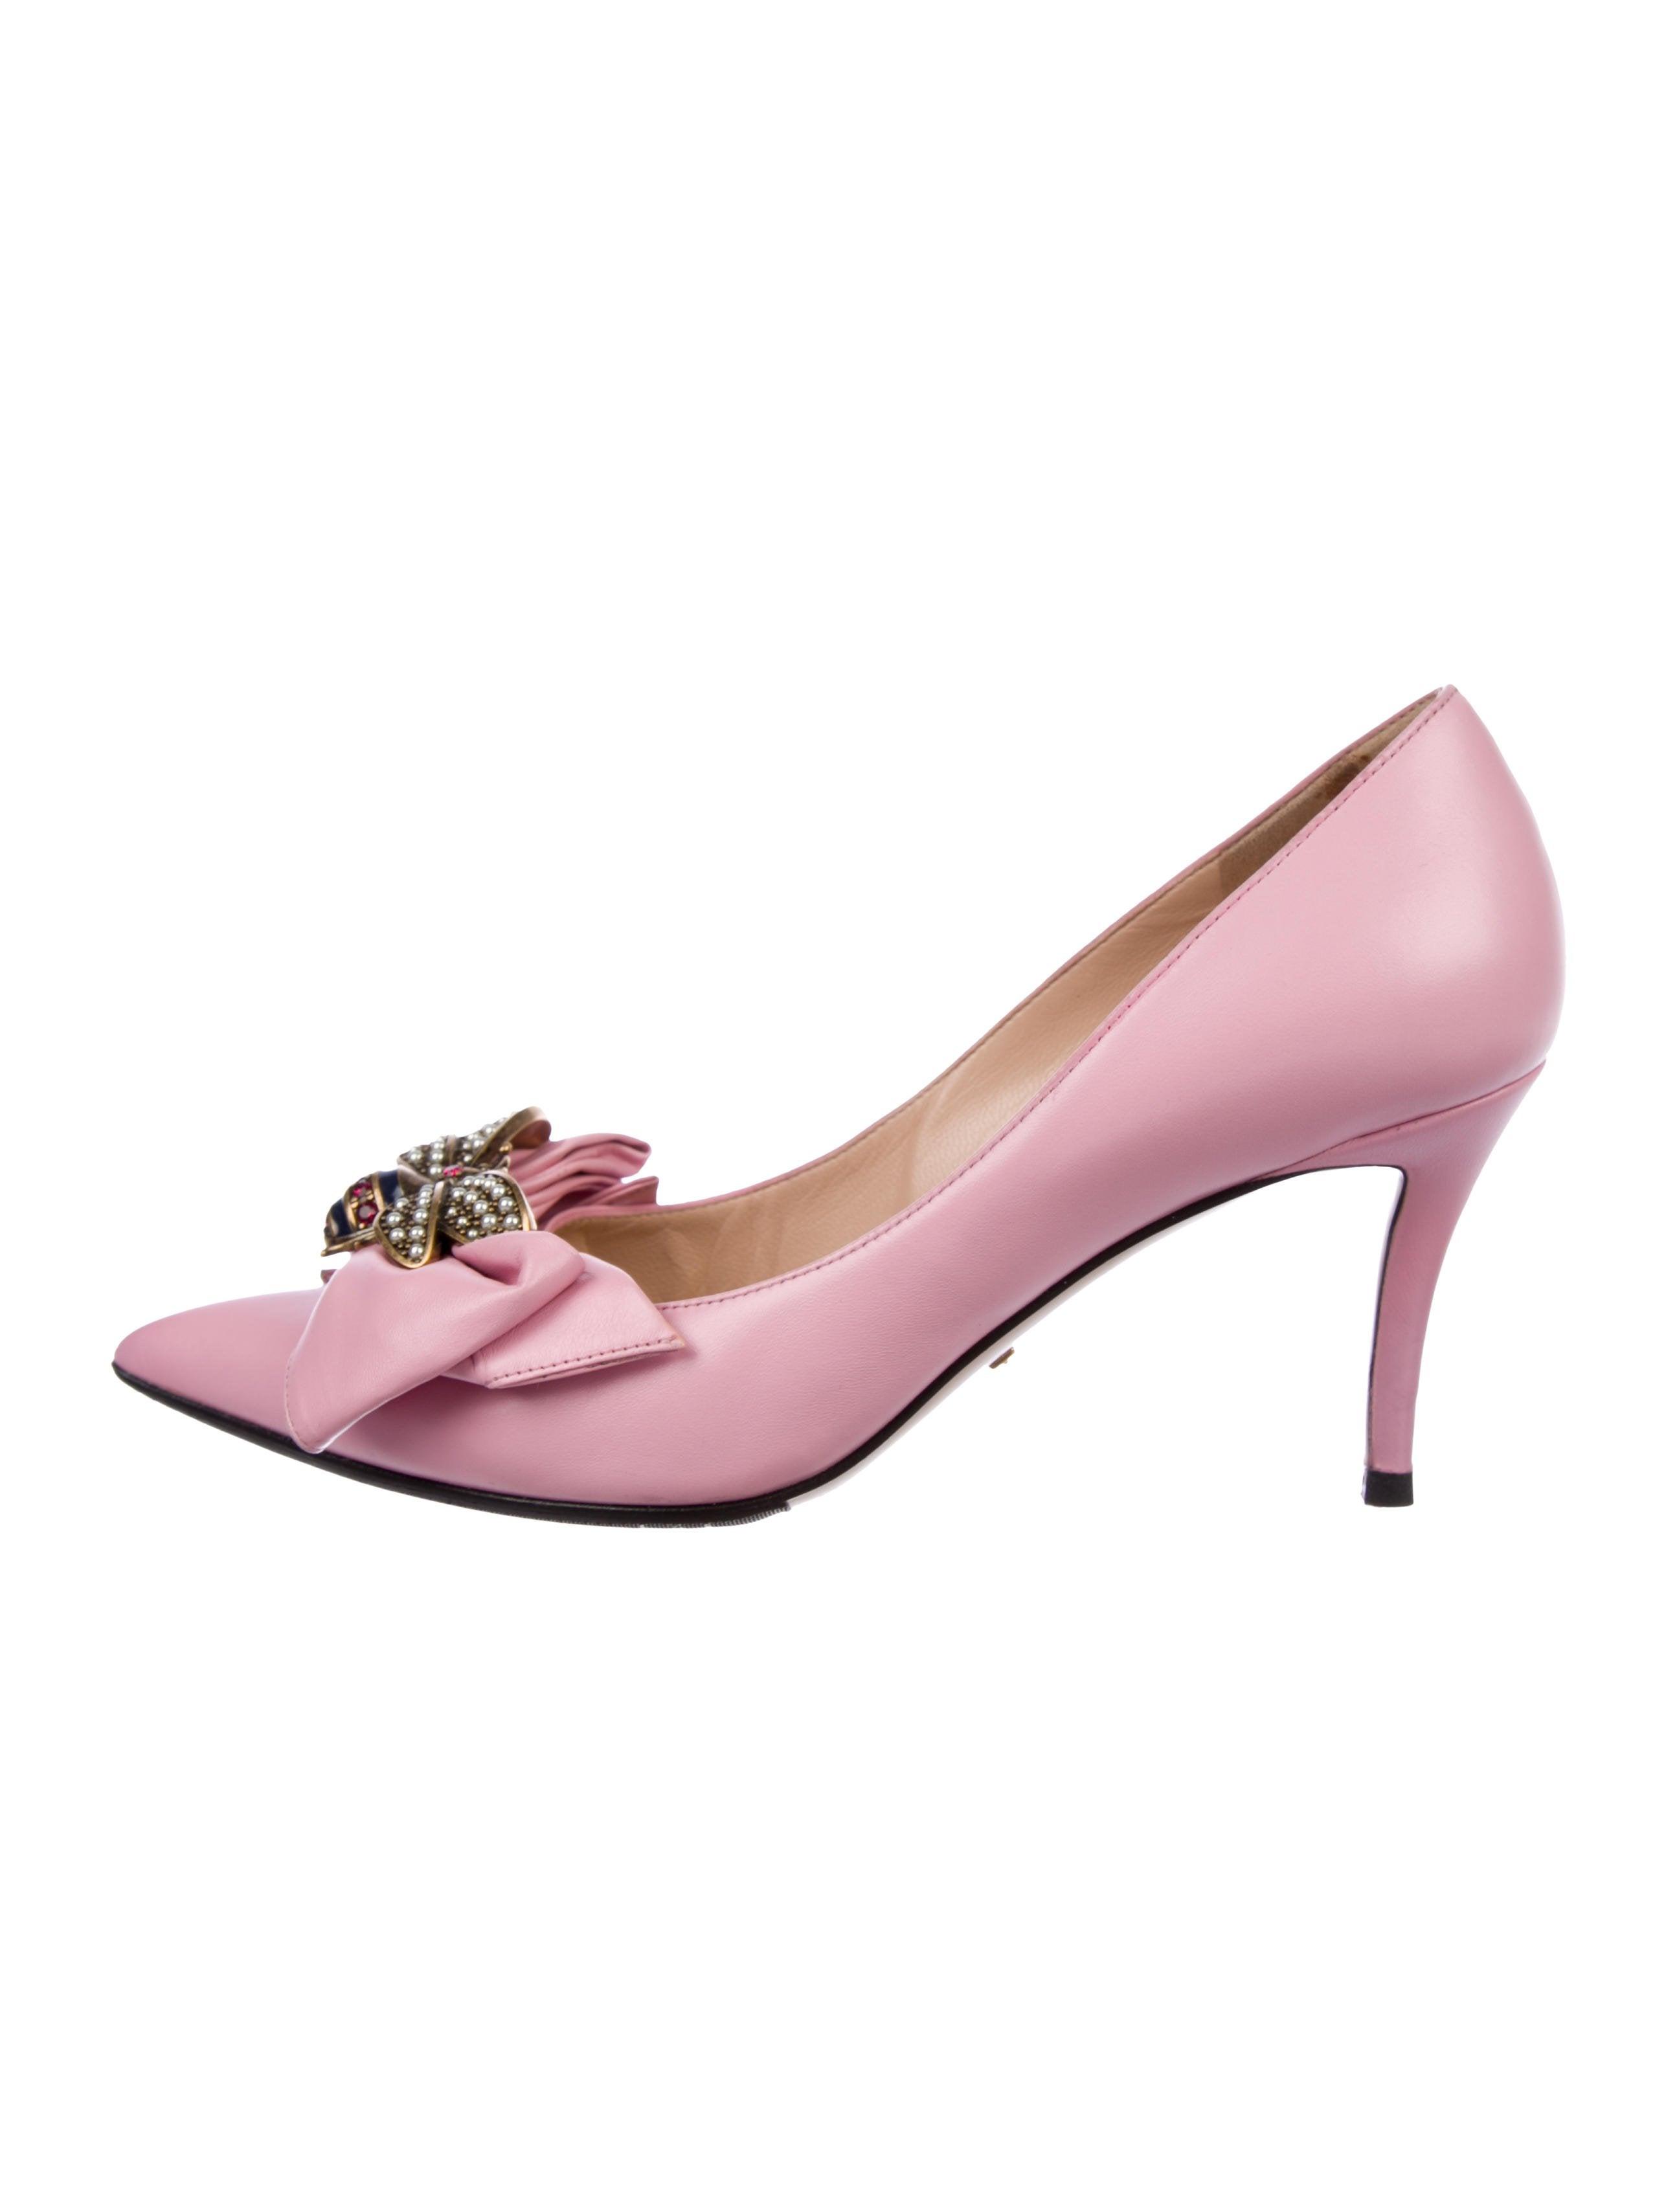 689c3515cd6 Gucci Queen Margaret Leather Pumps - Shoes - GUC250487